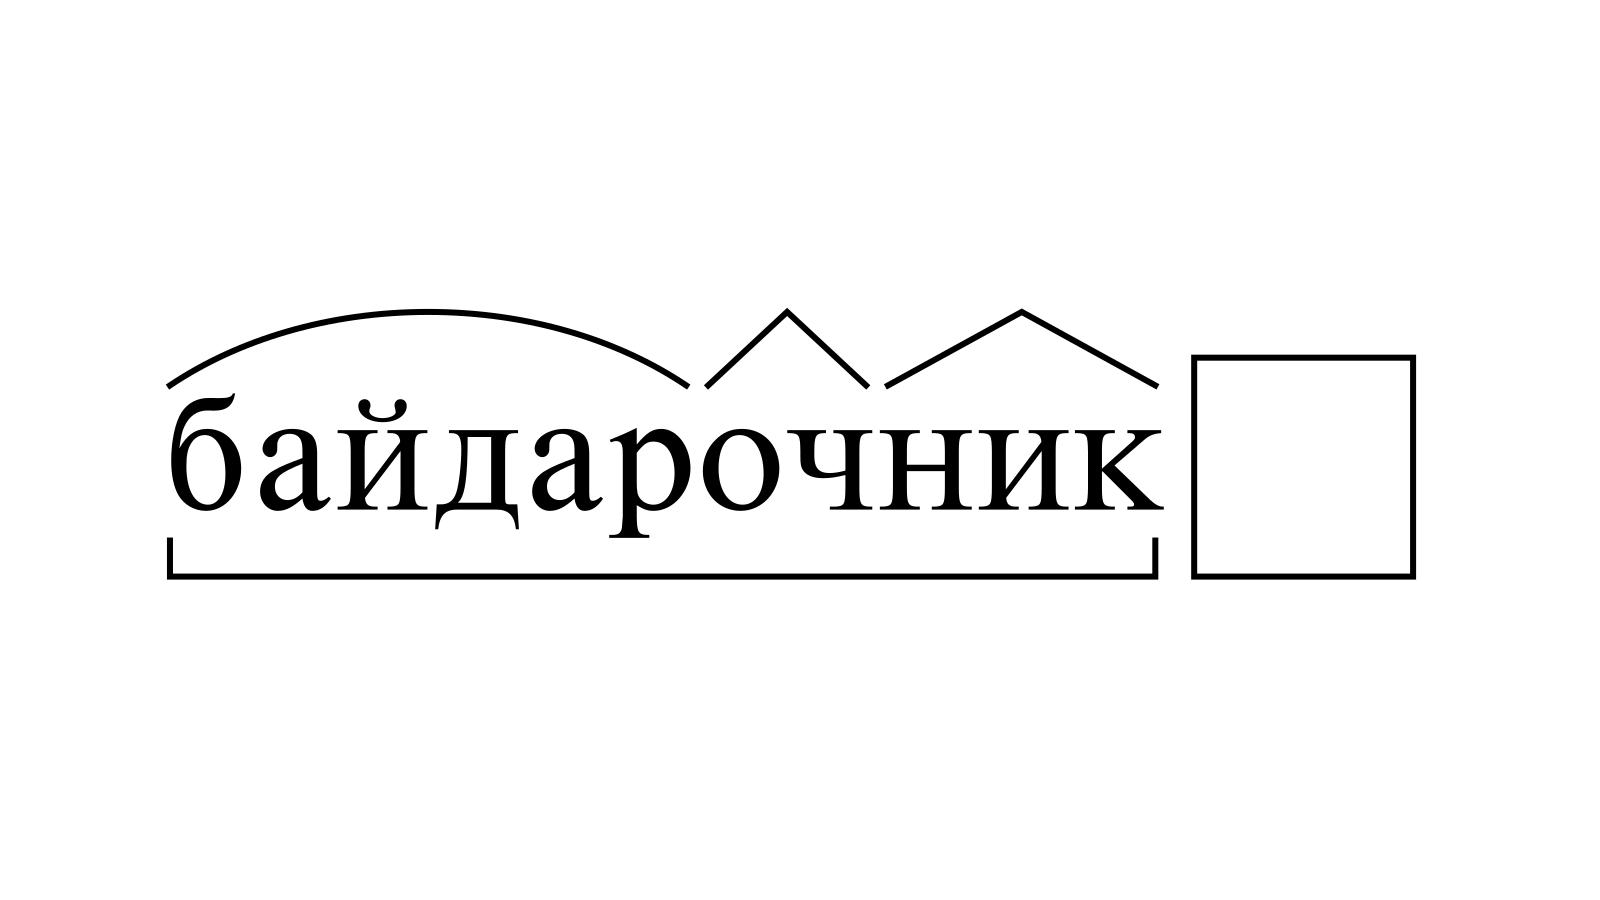 Разбор слова «байдарочник» по составу